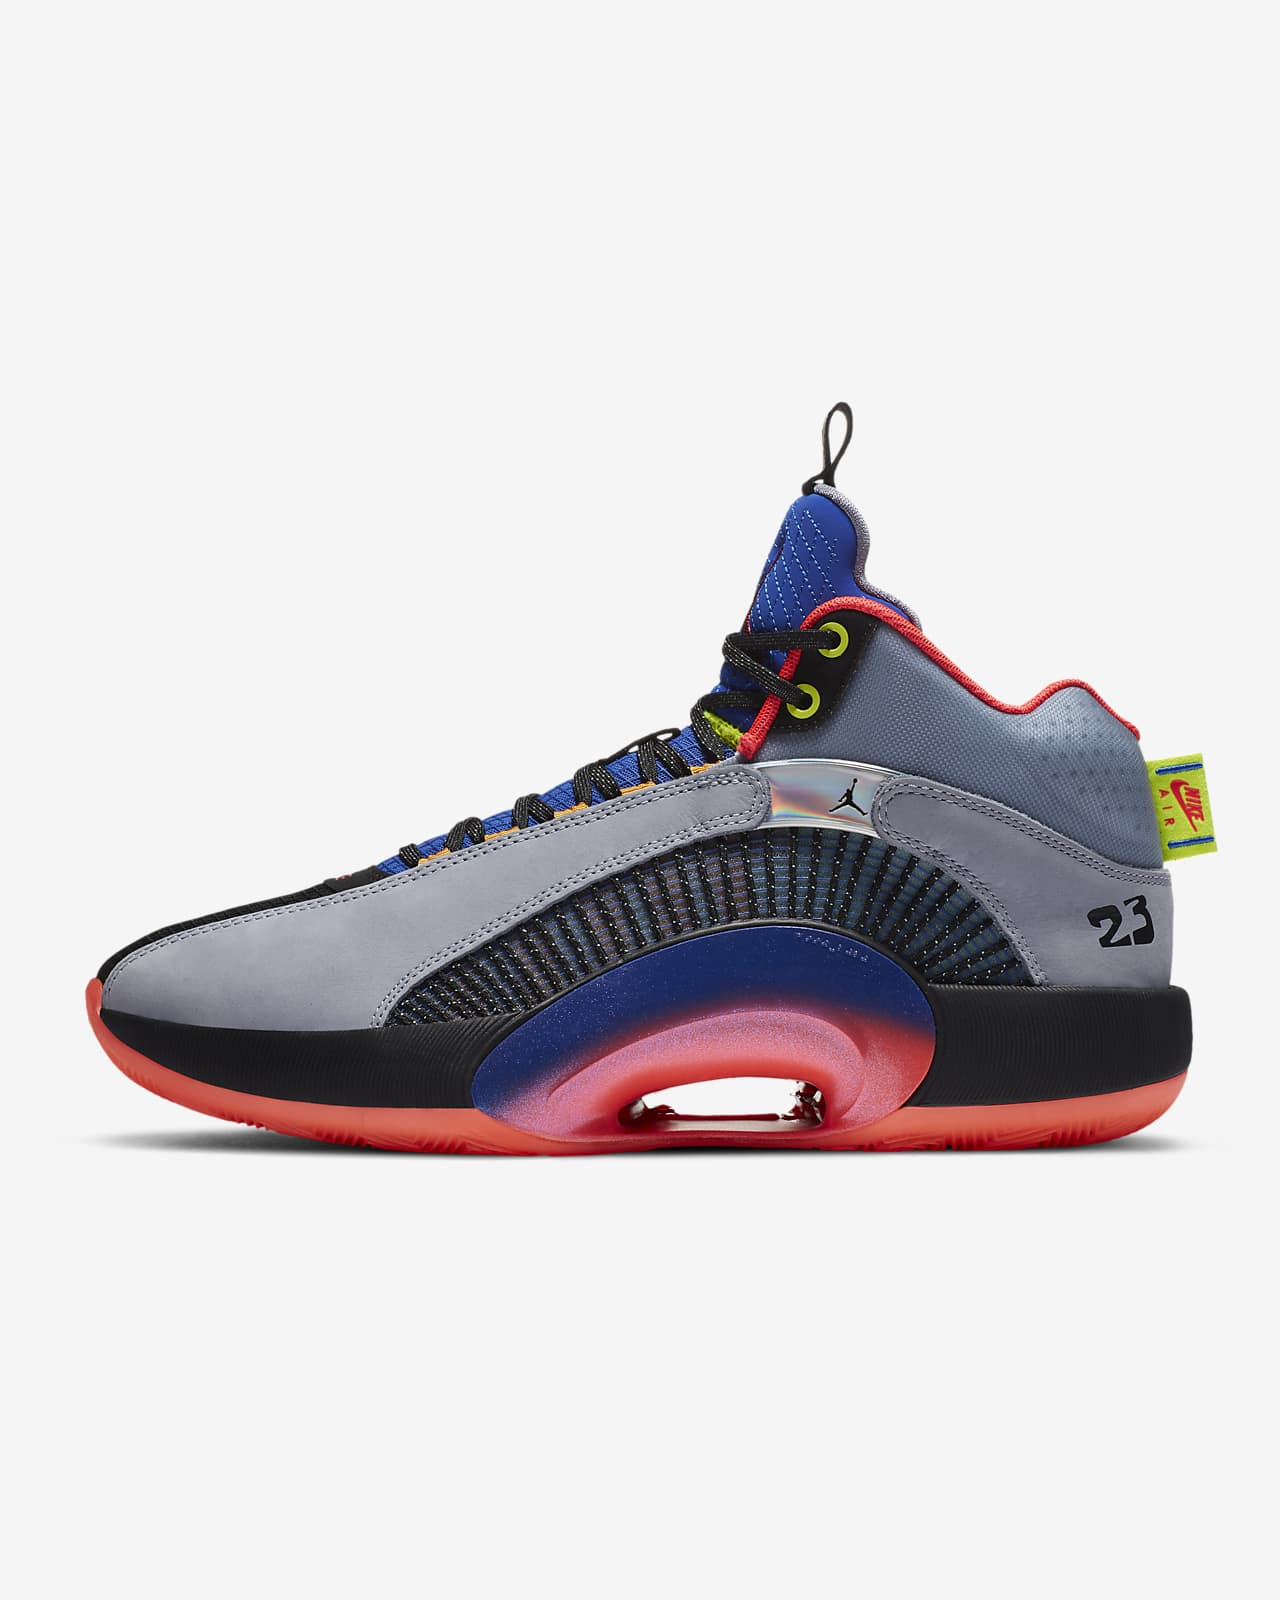 Air Jordan XXXV 'Centre of Gravity' Basketball Shoe